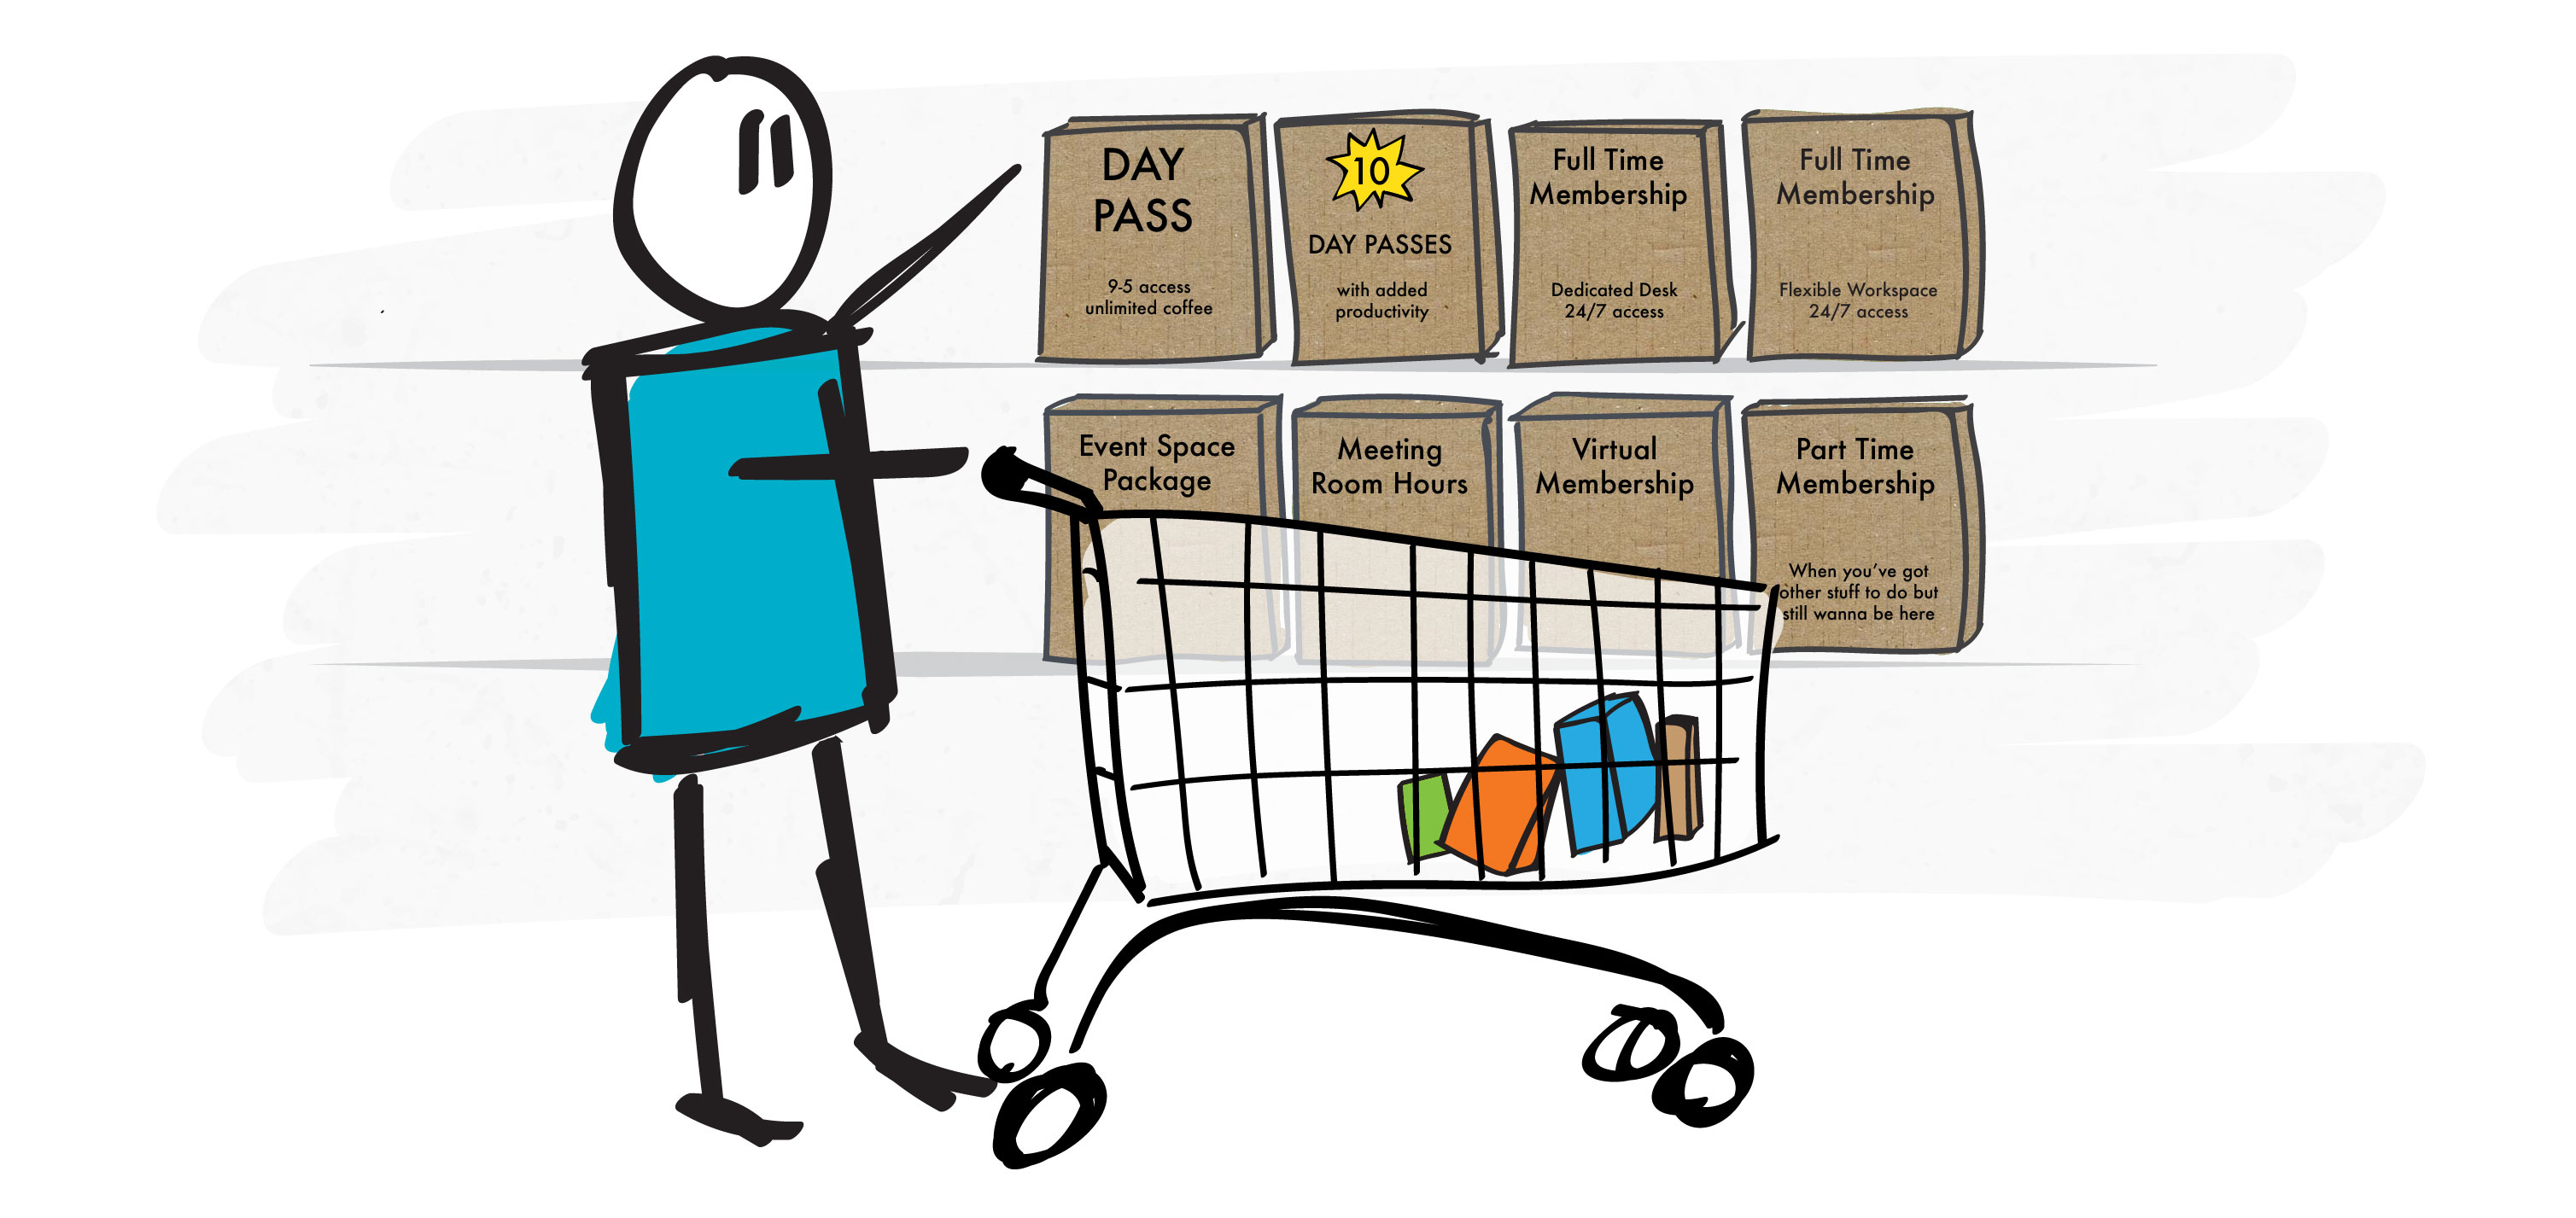 habu-coworking-day-pass-workspace-management-software